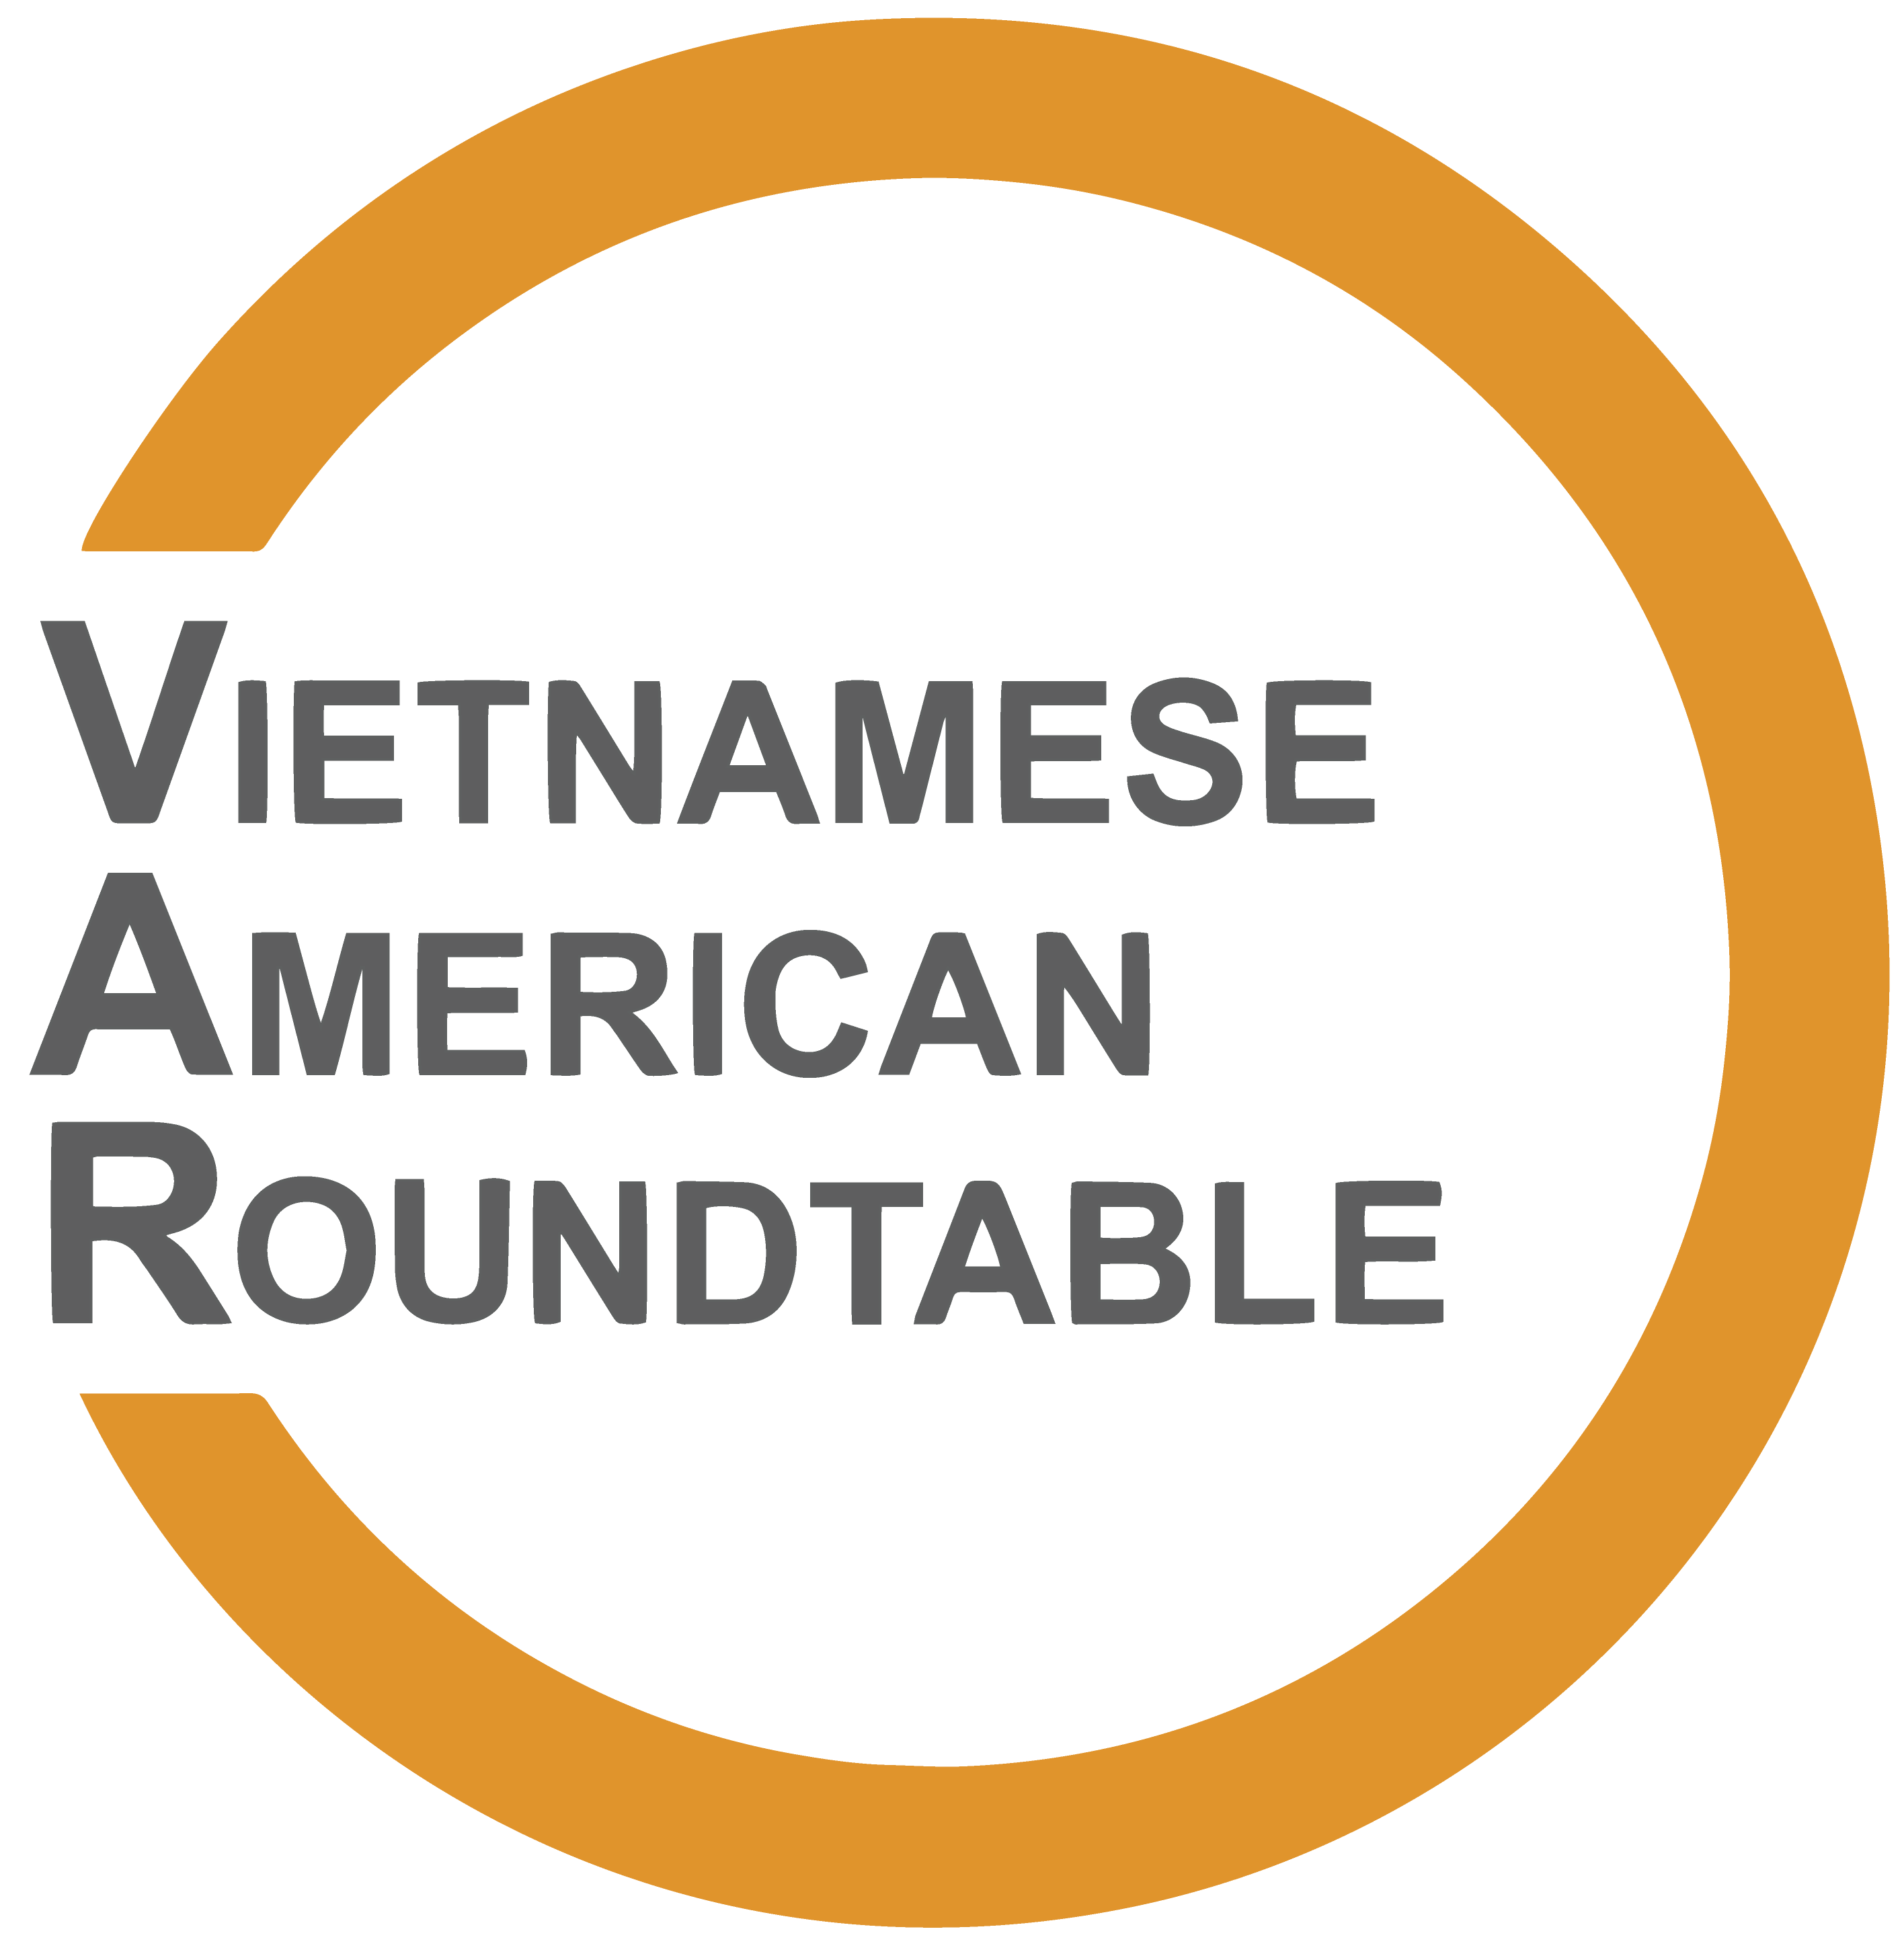 Vietnamese American Roundtable